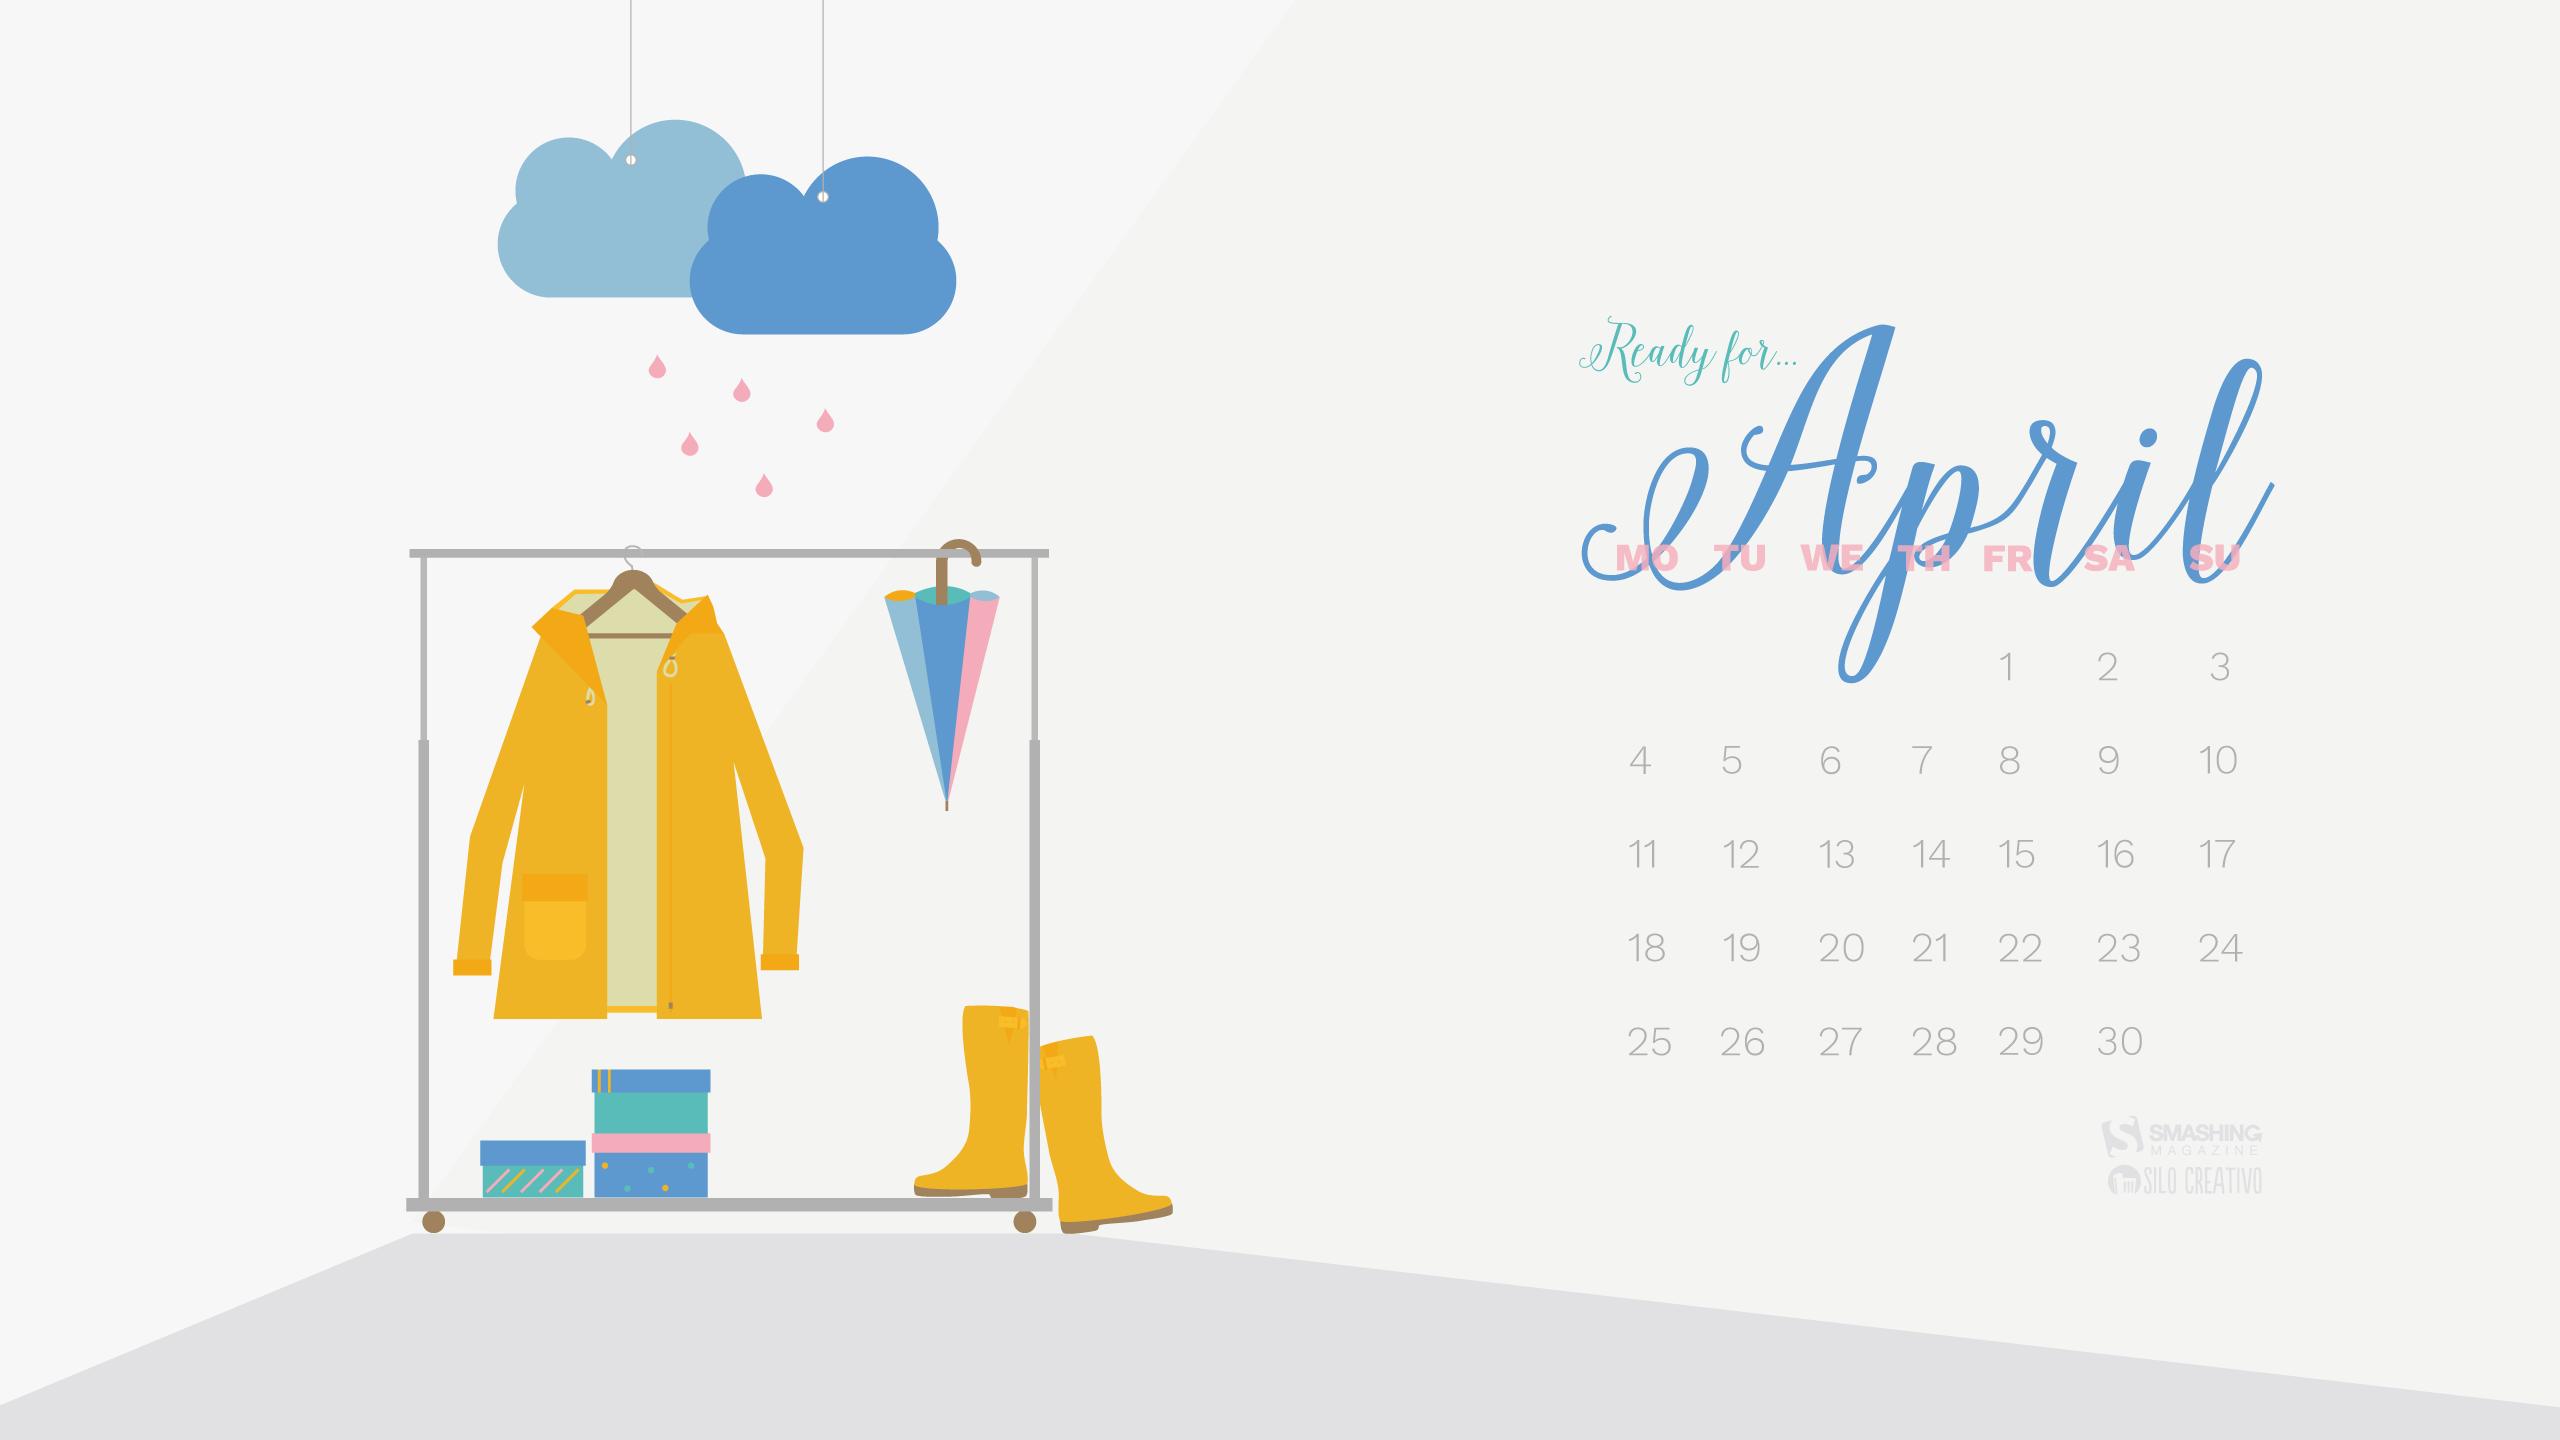 Desktop Wallpaper Calendars April 2016 Smashing Magazine 2560x1440